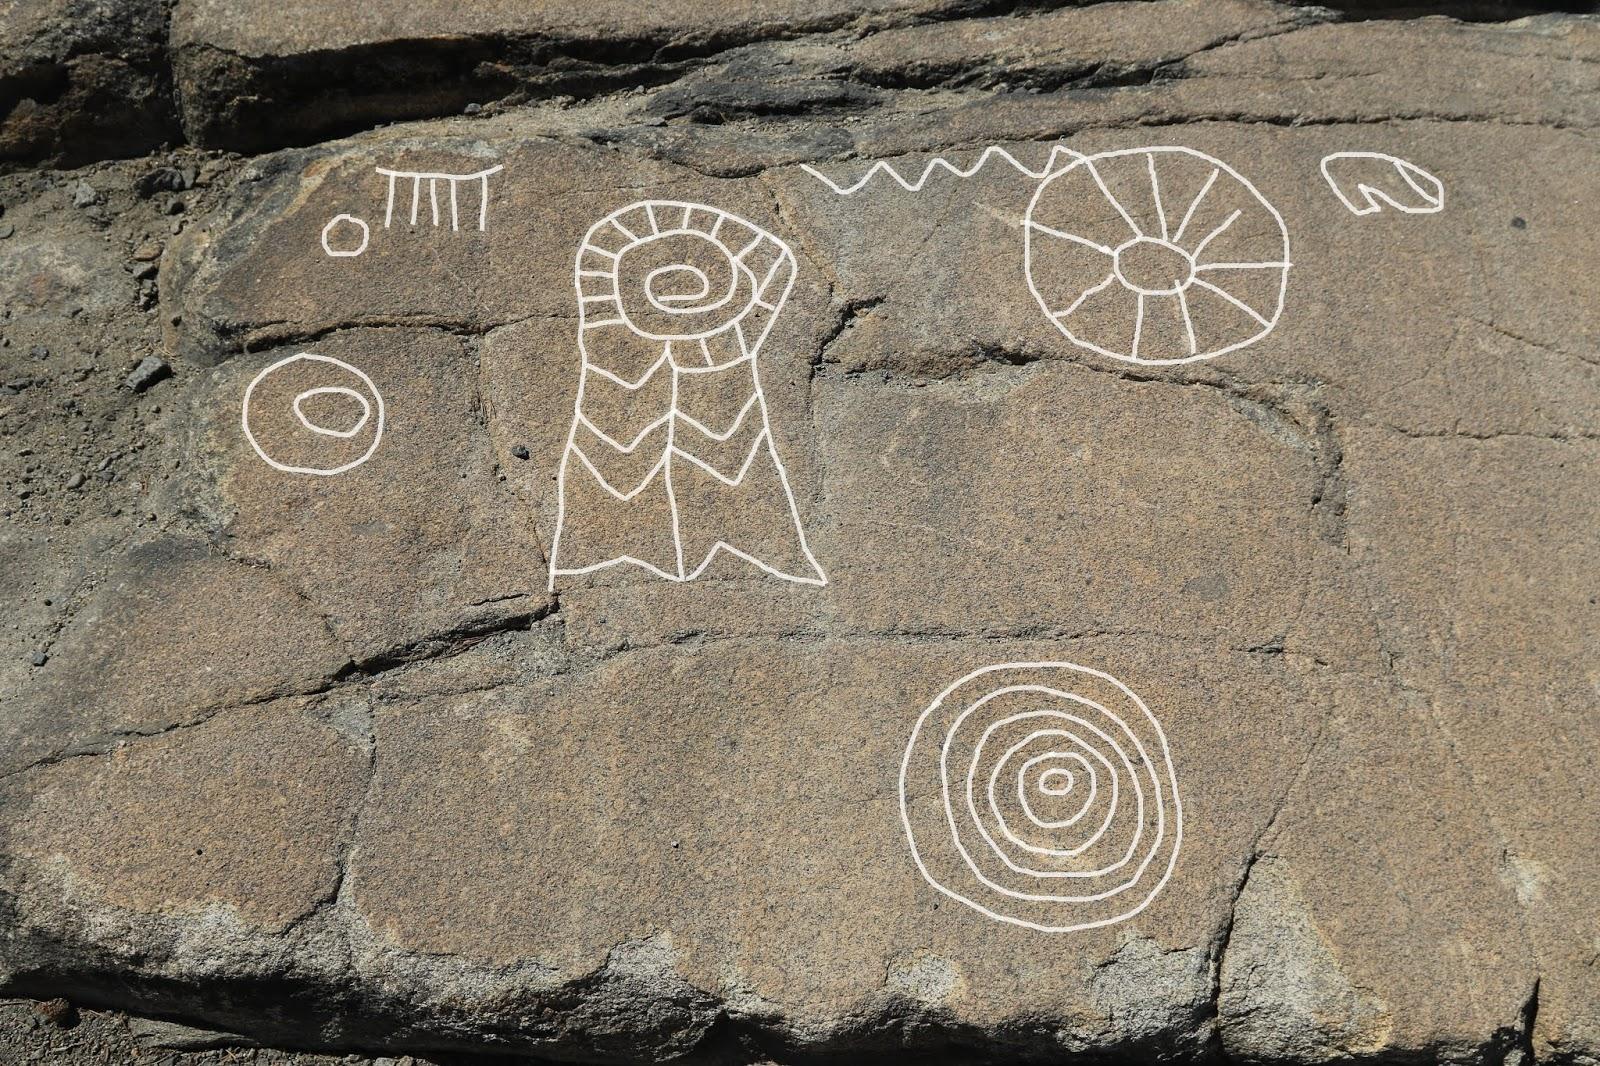 Gjhikes Com Donner Pass Petroglyphs